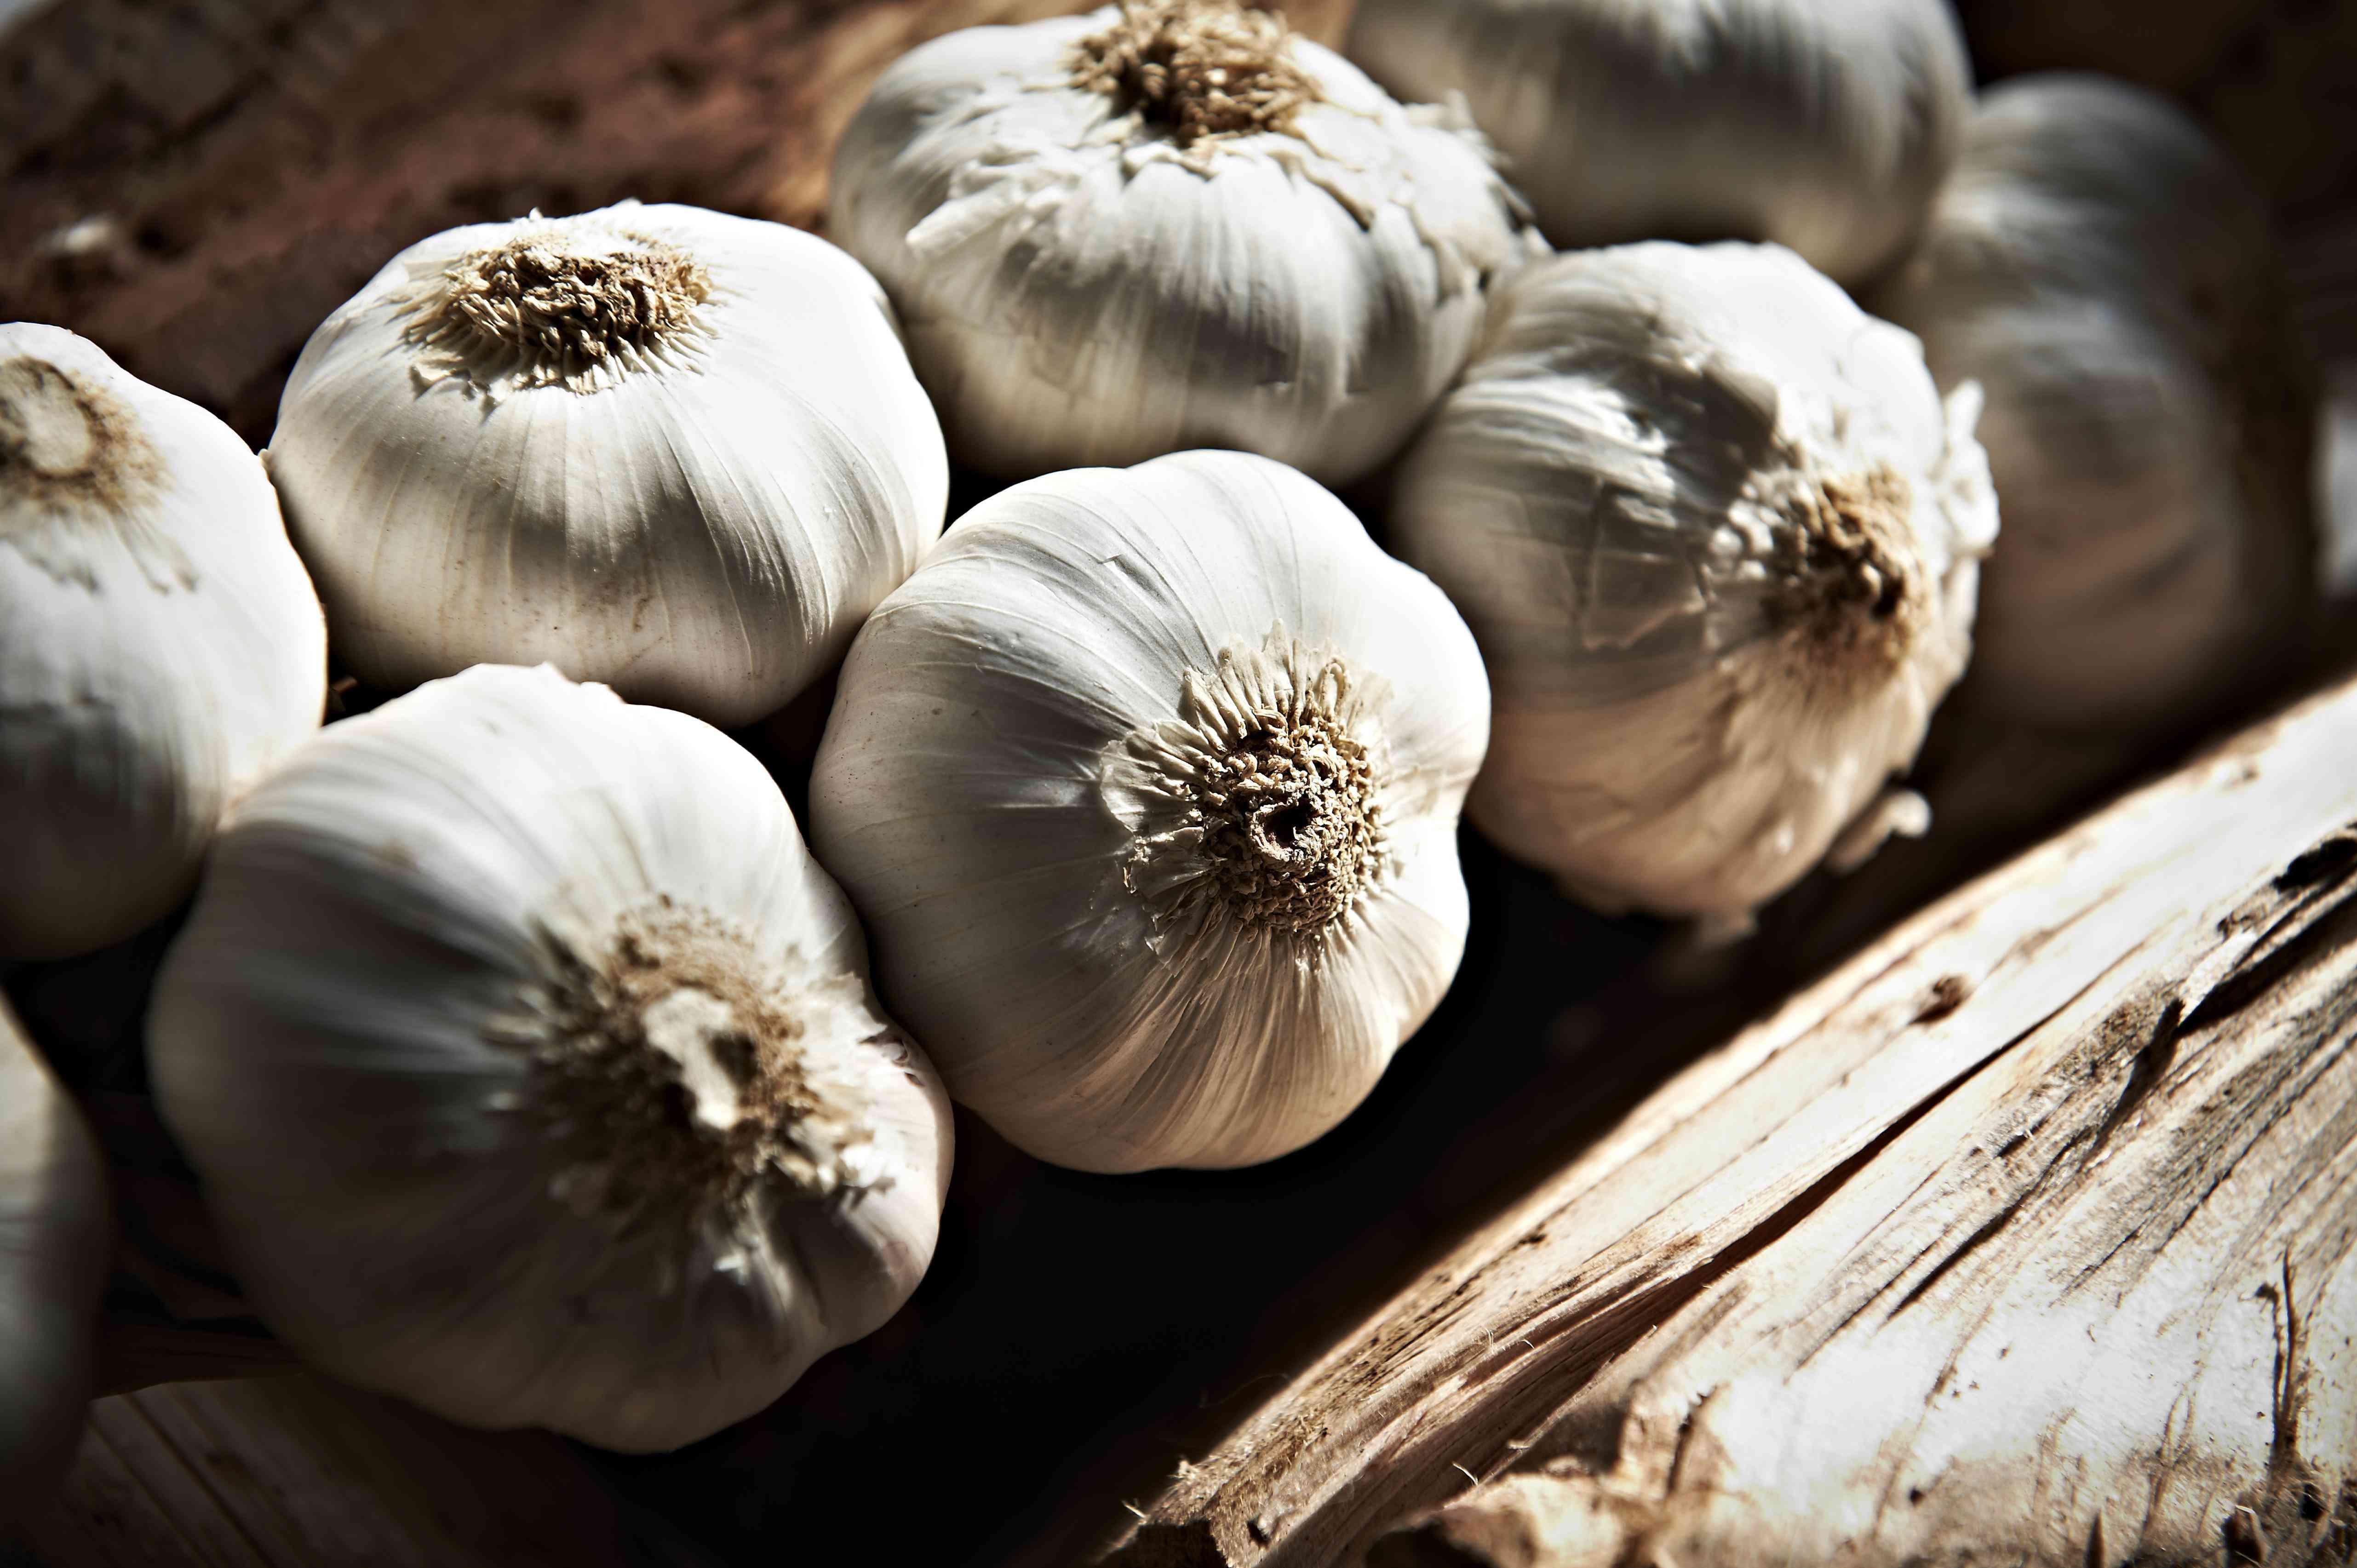 Garlic bulbs close up